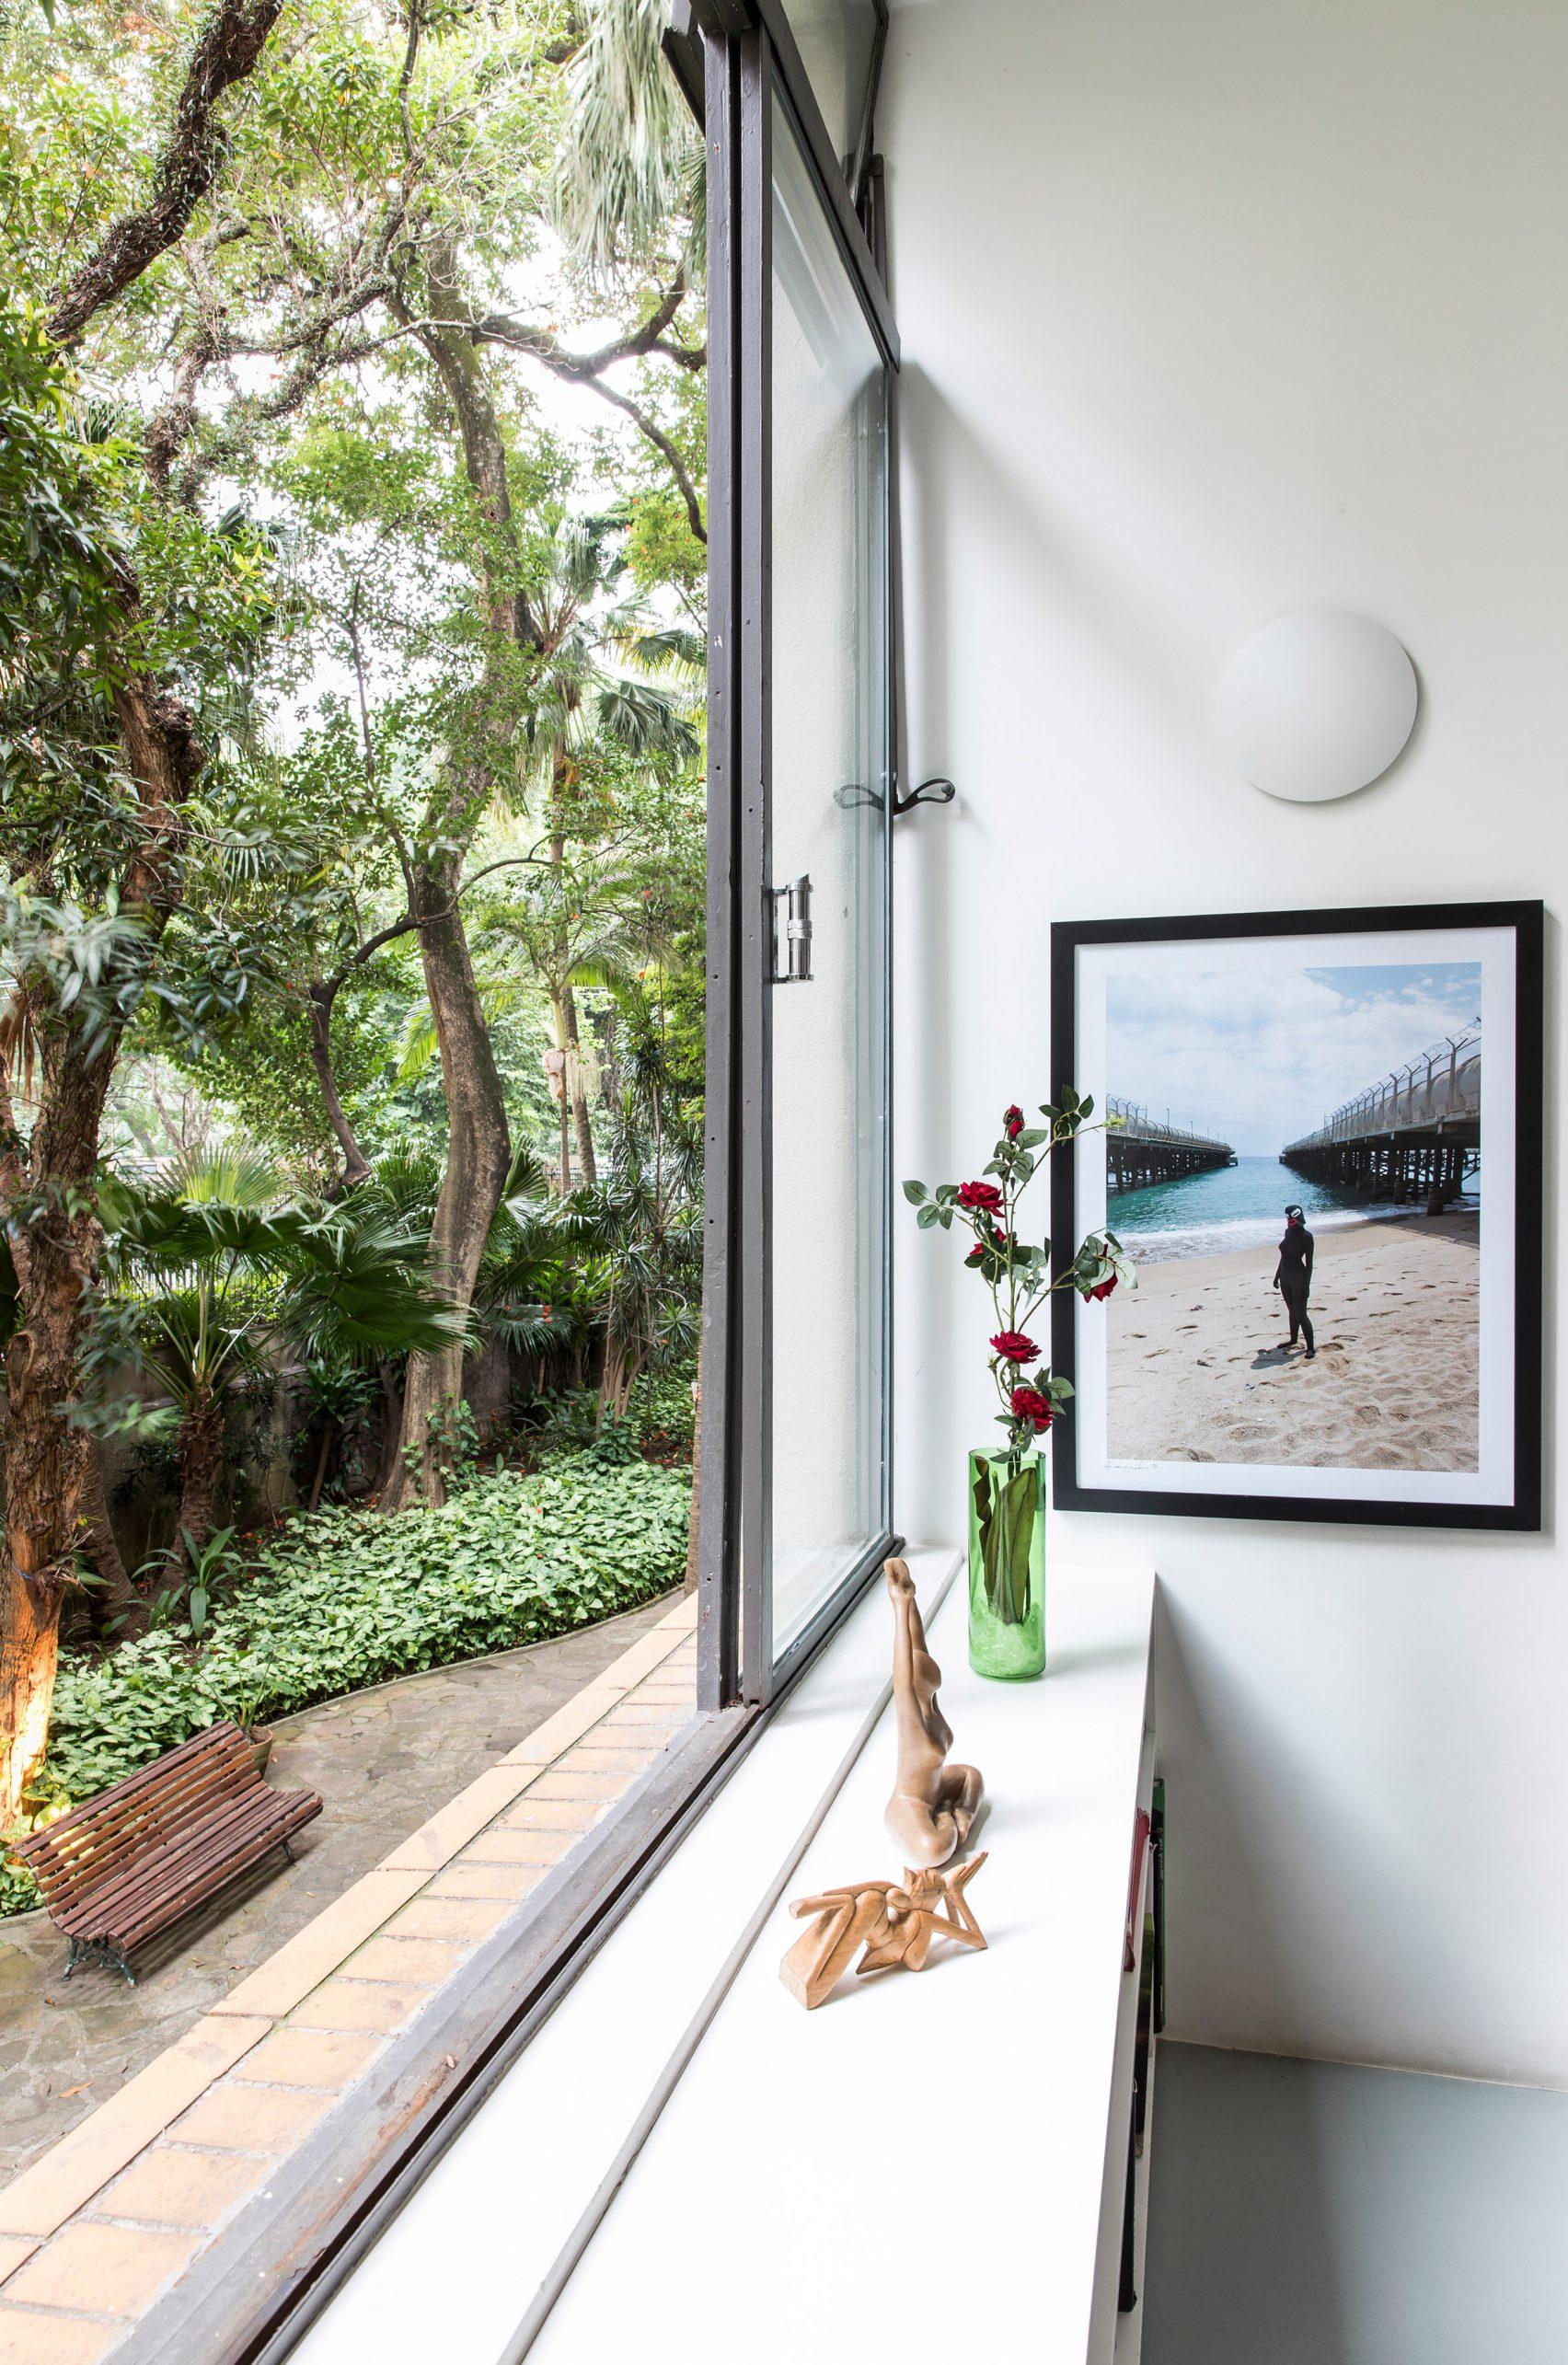 tucuma-apartment-cupertino-arquitetura-sao-paulo-brazil_dezeen_2364_col_4-1704x2570